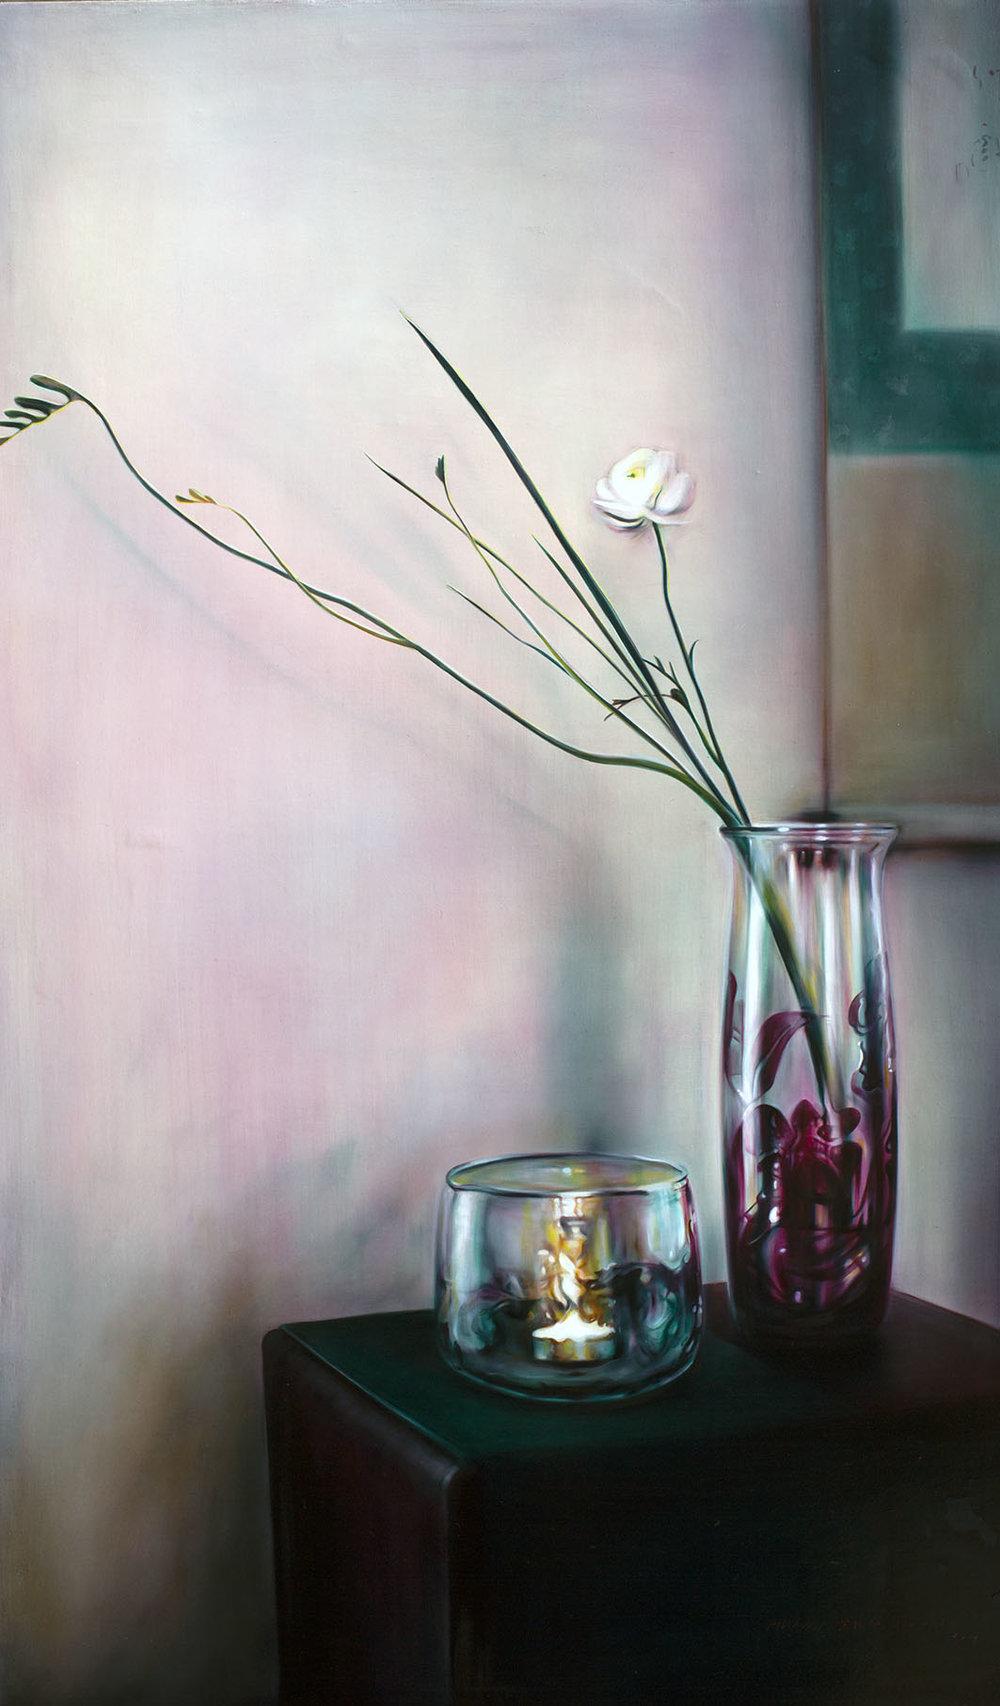 溫度-寧靜 Temperature-tranquility  145.5 x 97 cm 油彩畫布 Oil on Canvas 2017